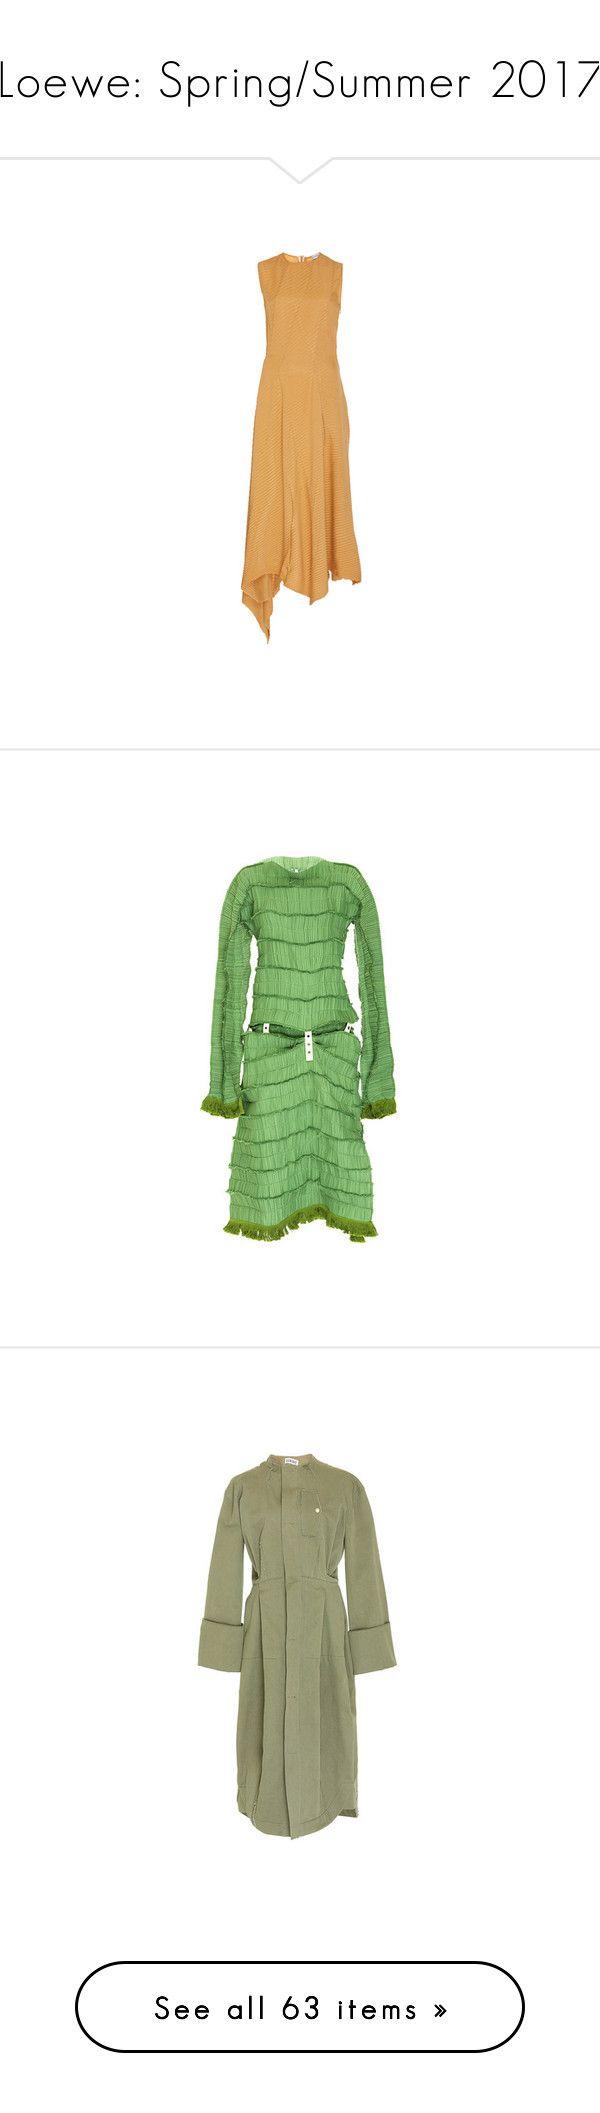 """Loewe: Spring/Summer 2017"" by livnd ❤ liked on Polyvore featuring loewe, springsummer2017, livndfashion, livndloewe, dresses, beige dress, jewel neckline dress, a line dress, boat neck sheath dress and green boat neck dress"